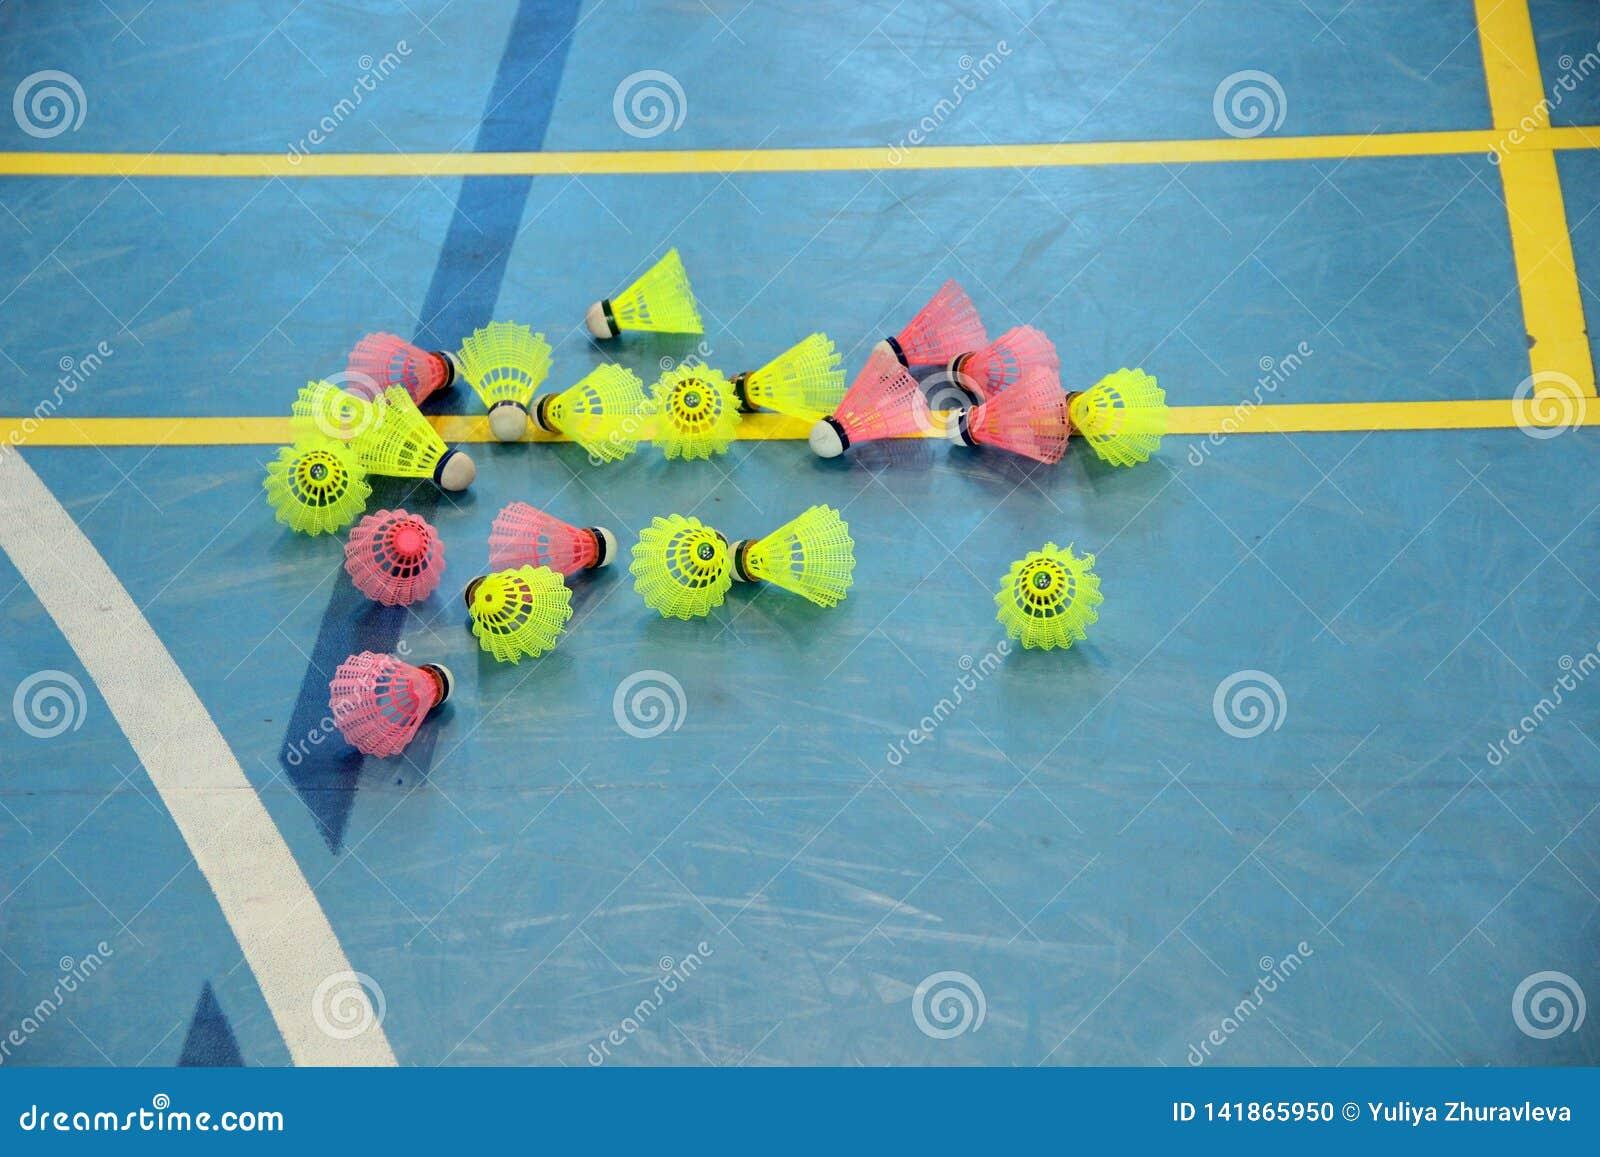 Rosa do lote e petecas amarelas na borda da corte de badminton